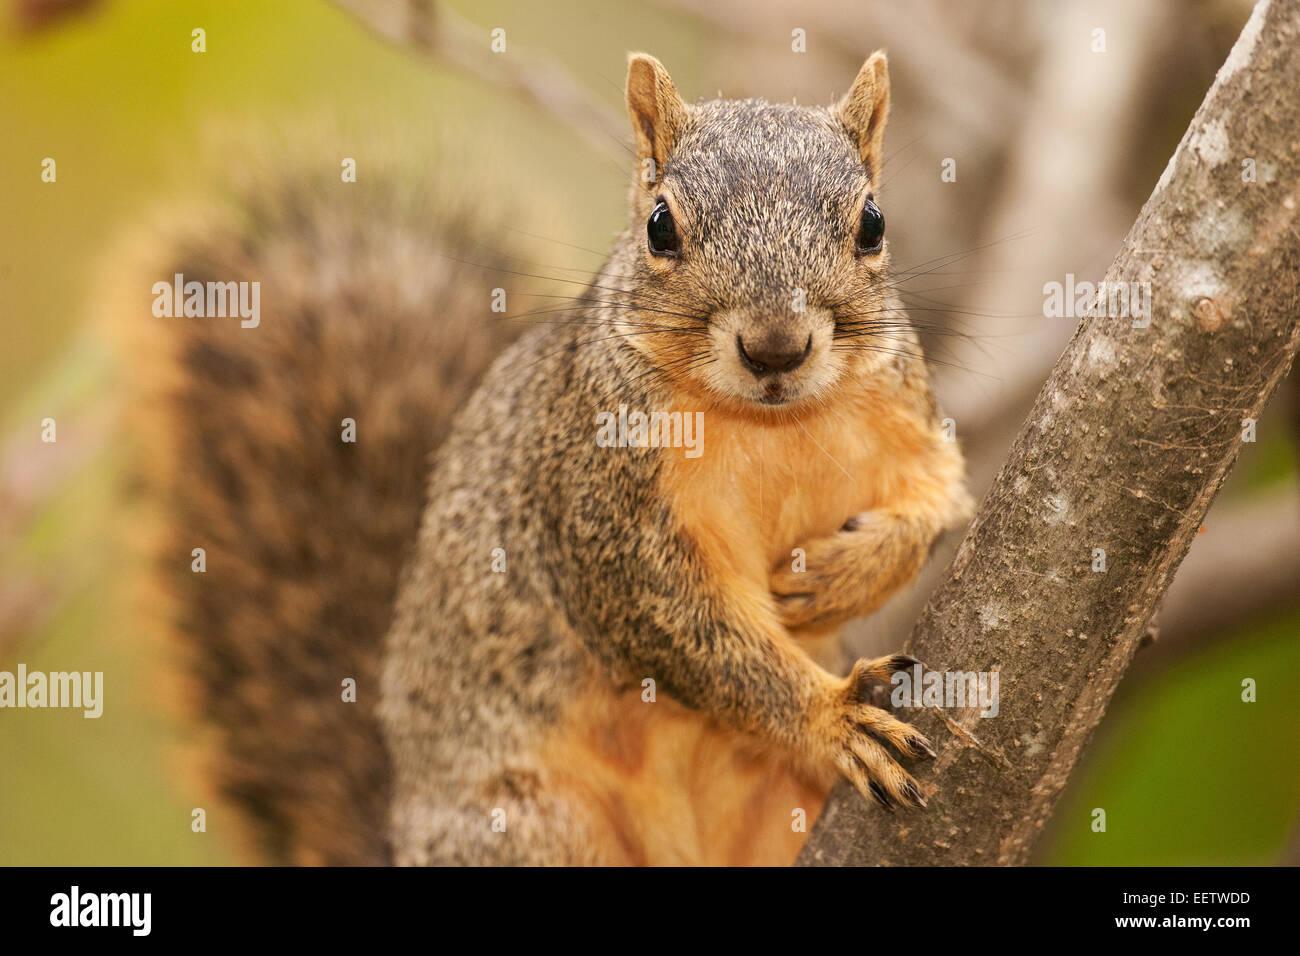 eastern fox squirrel climbing a tree in a backyard in houston